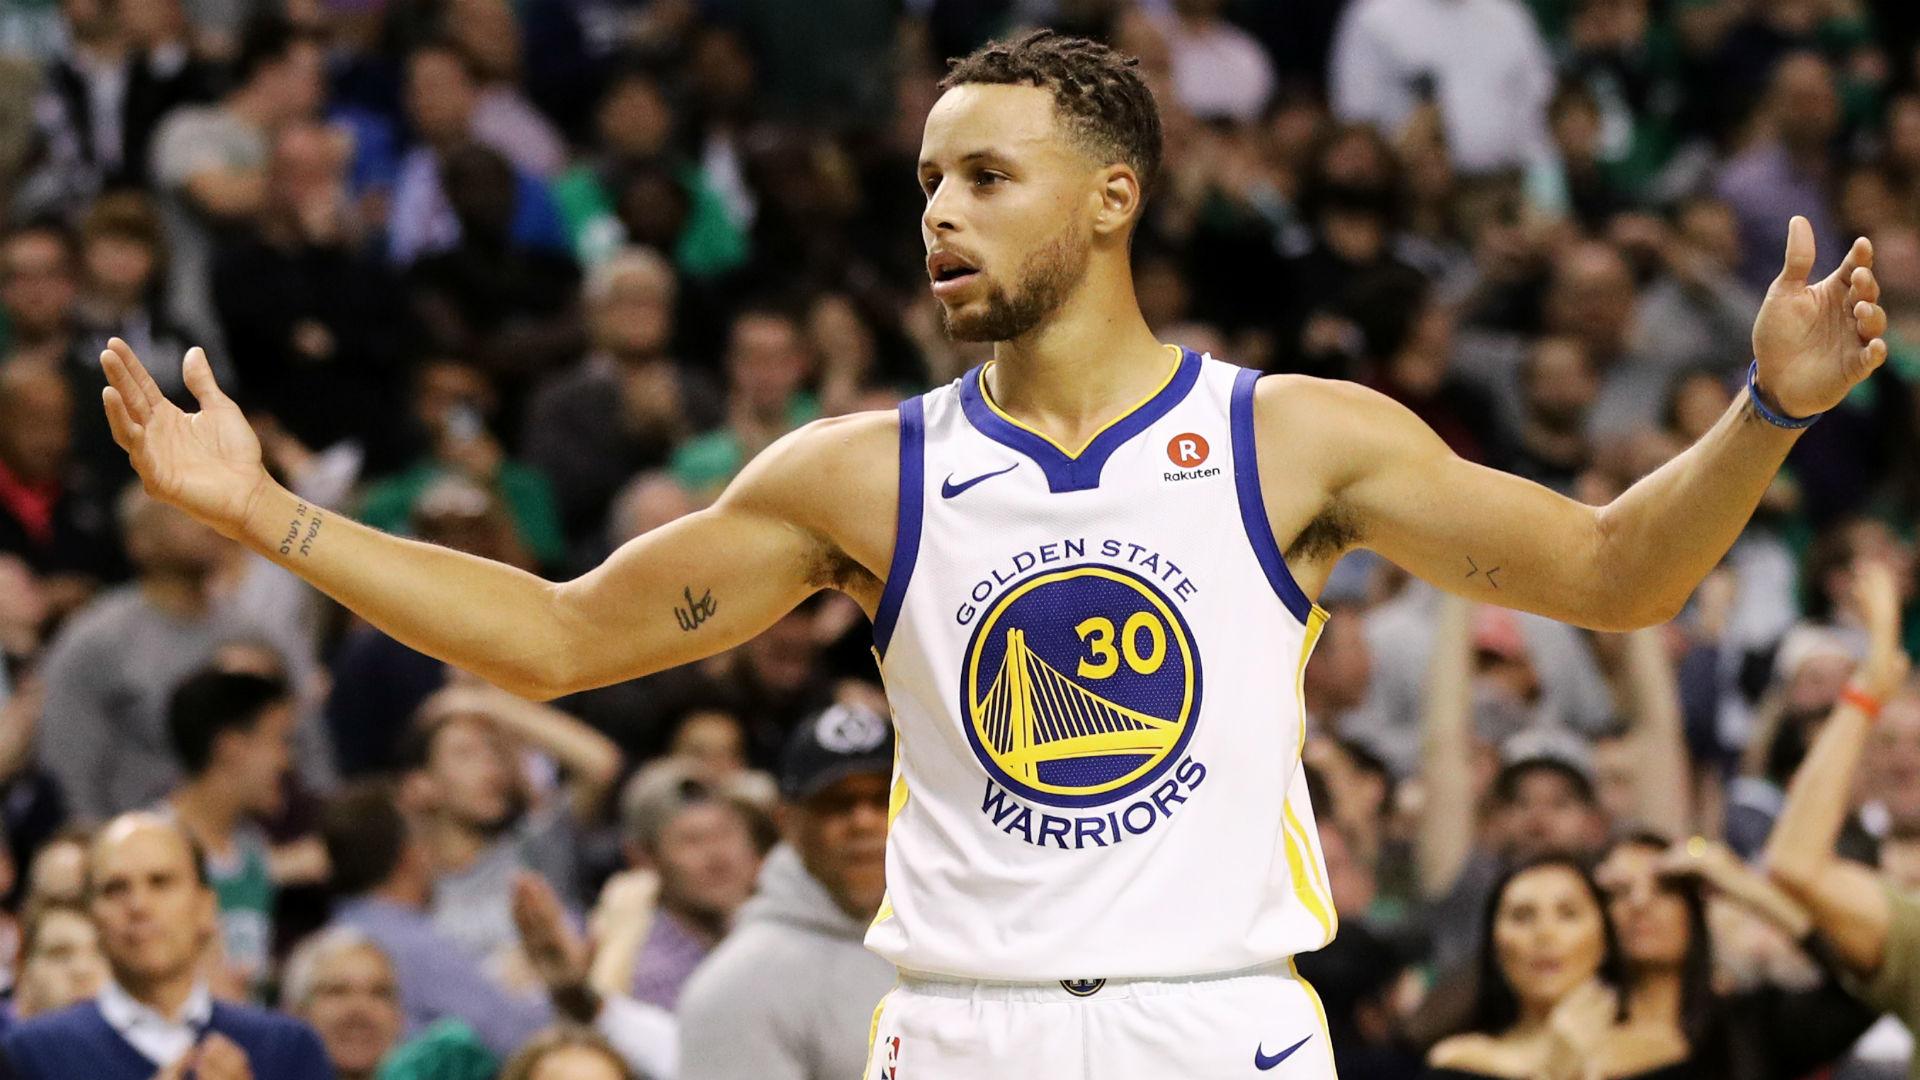 Stephen Curry, Klay Thompson still unable to solve Brad Stevens' defense | NBA | Sporting News